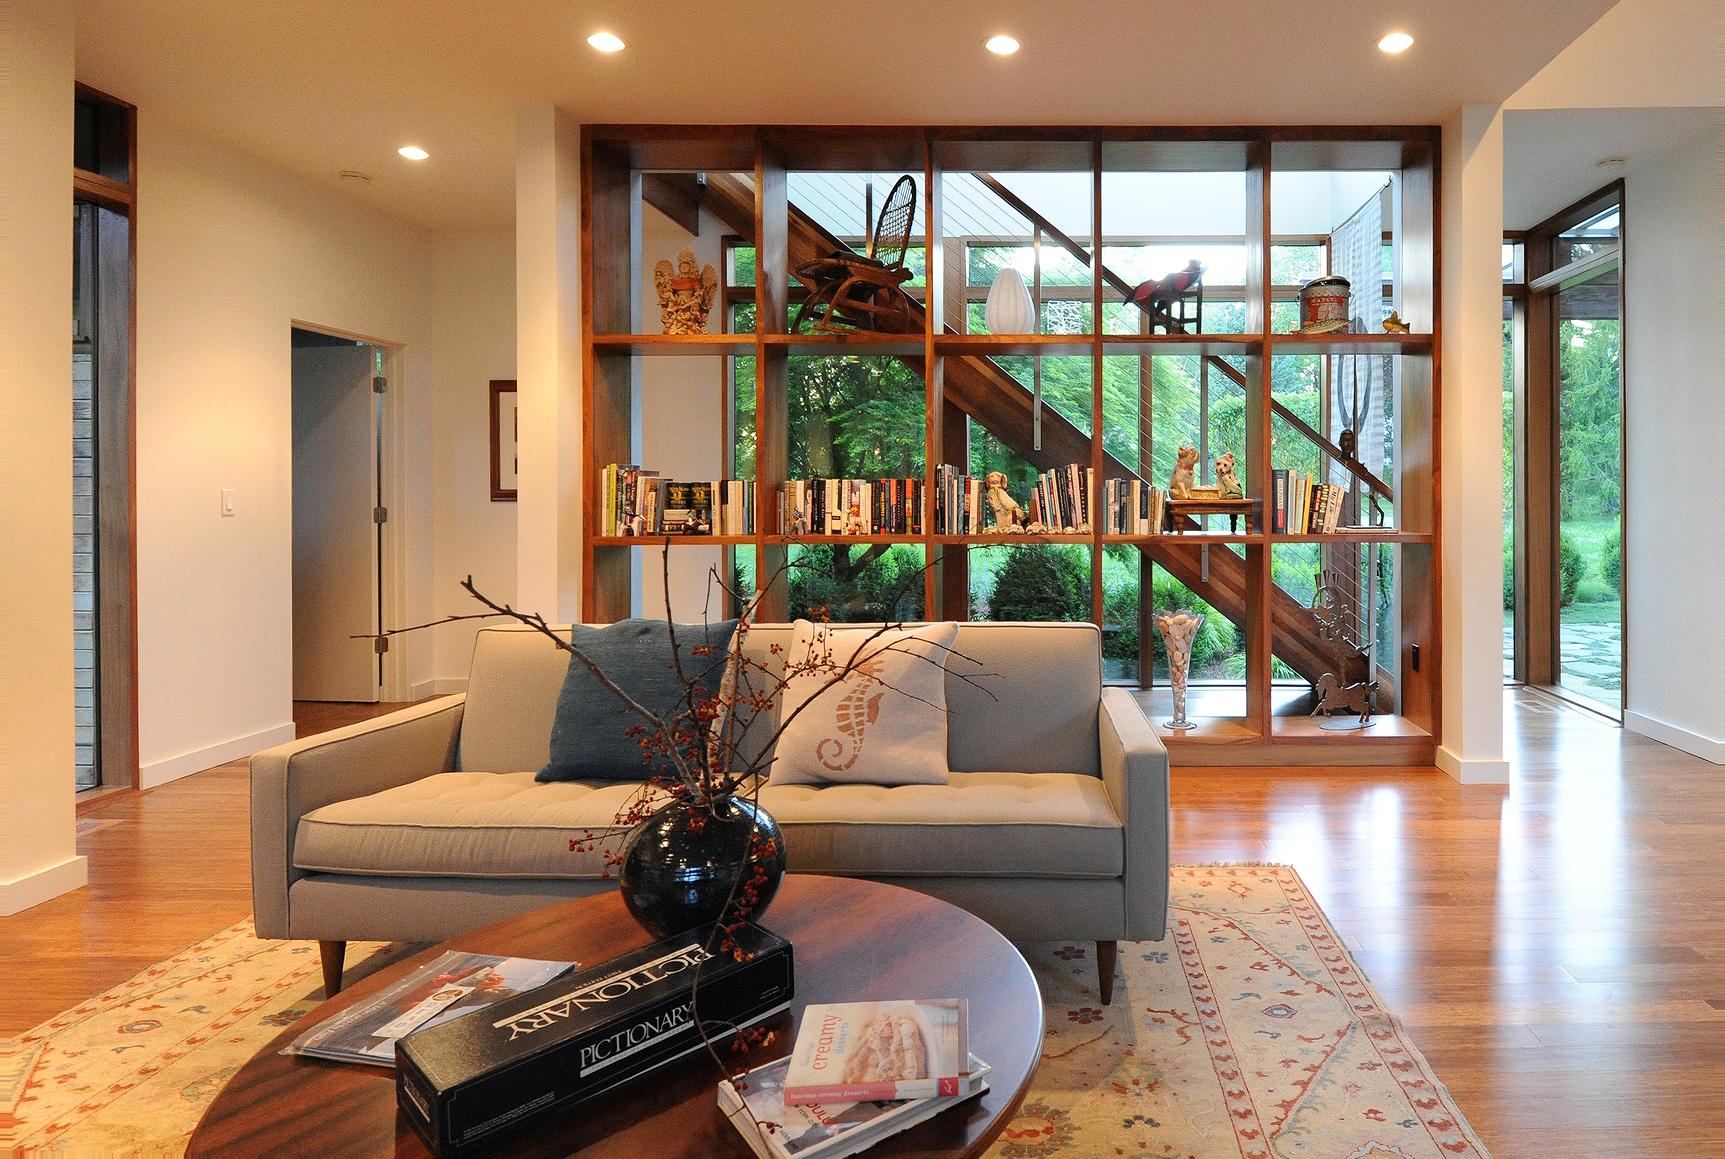 turkel_modern_design_prefab_shelter_island_living_room.jpg